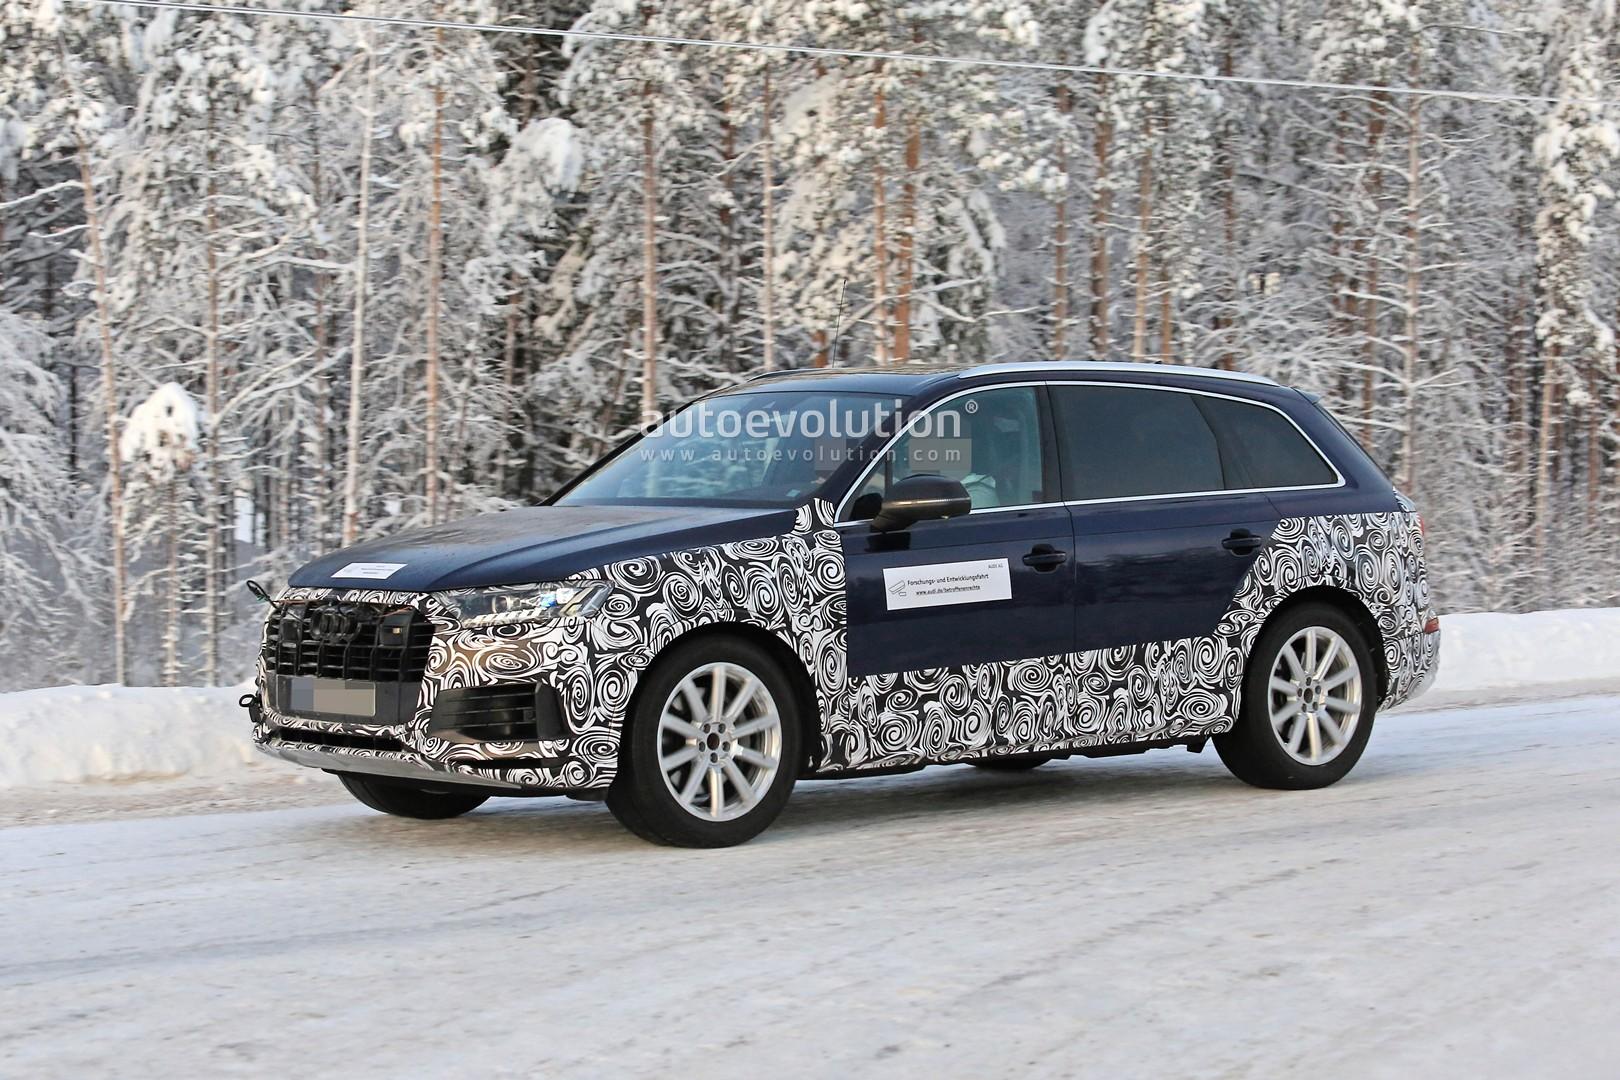 2020 Audi Q7 Facelift Enters The Golden Age Of Audi Design